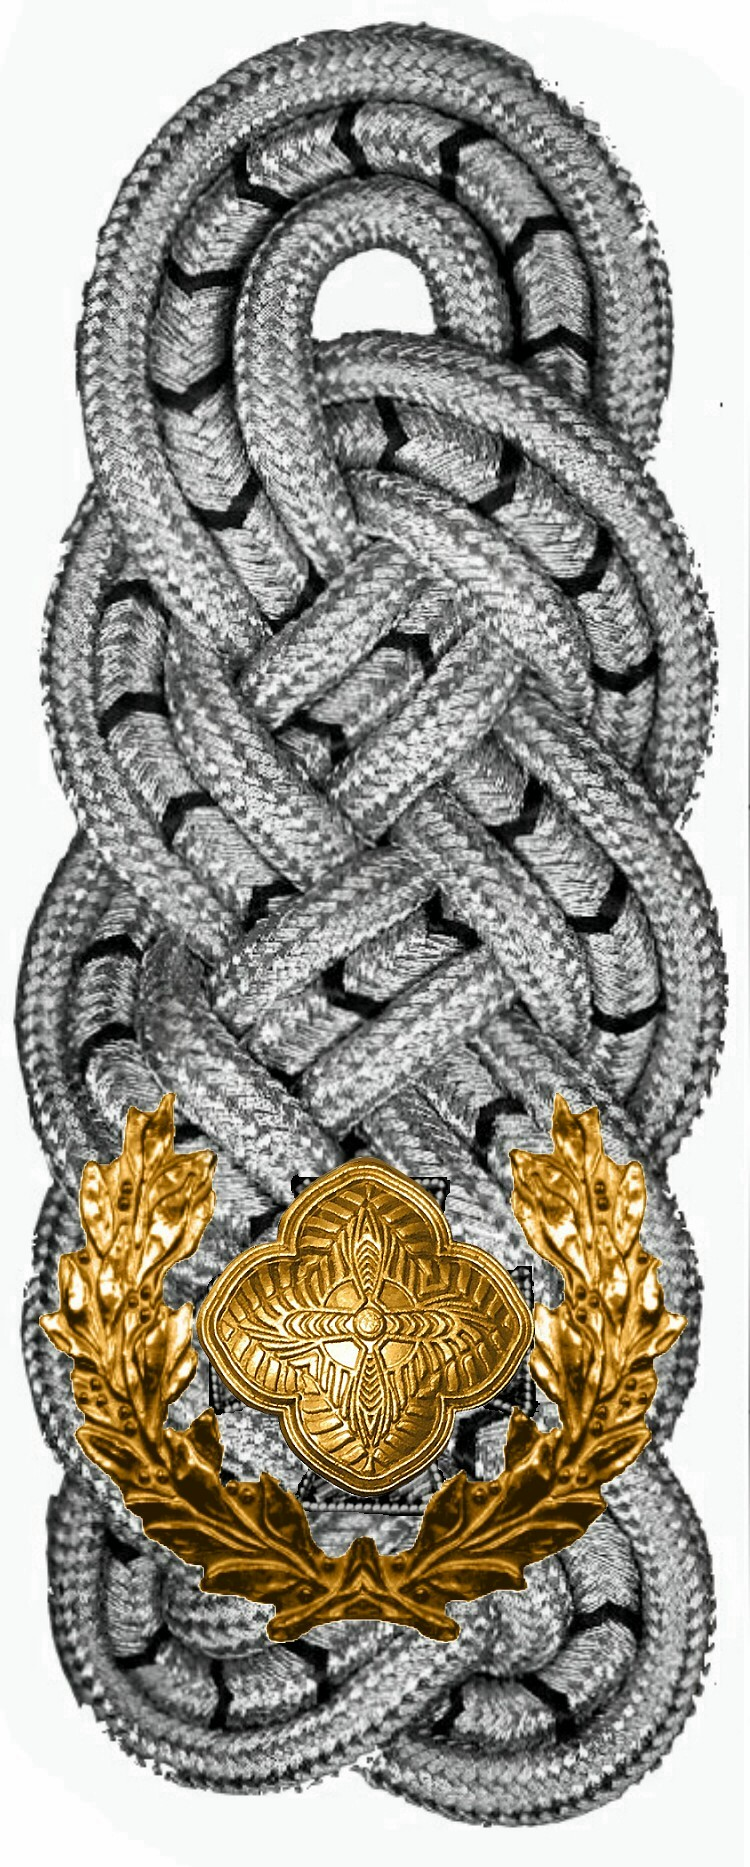 gala-gala-sergeant-major